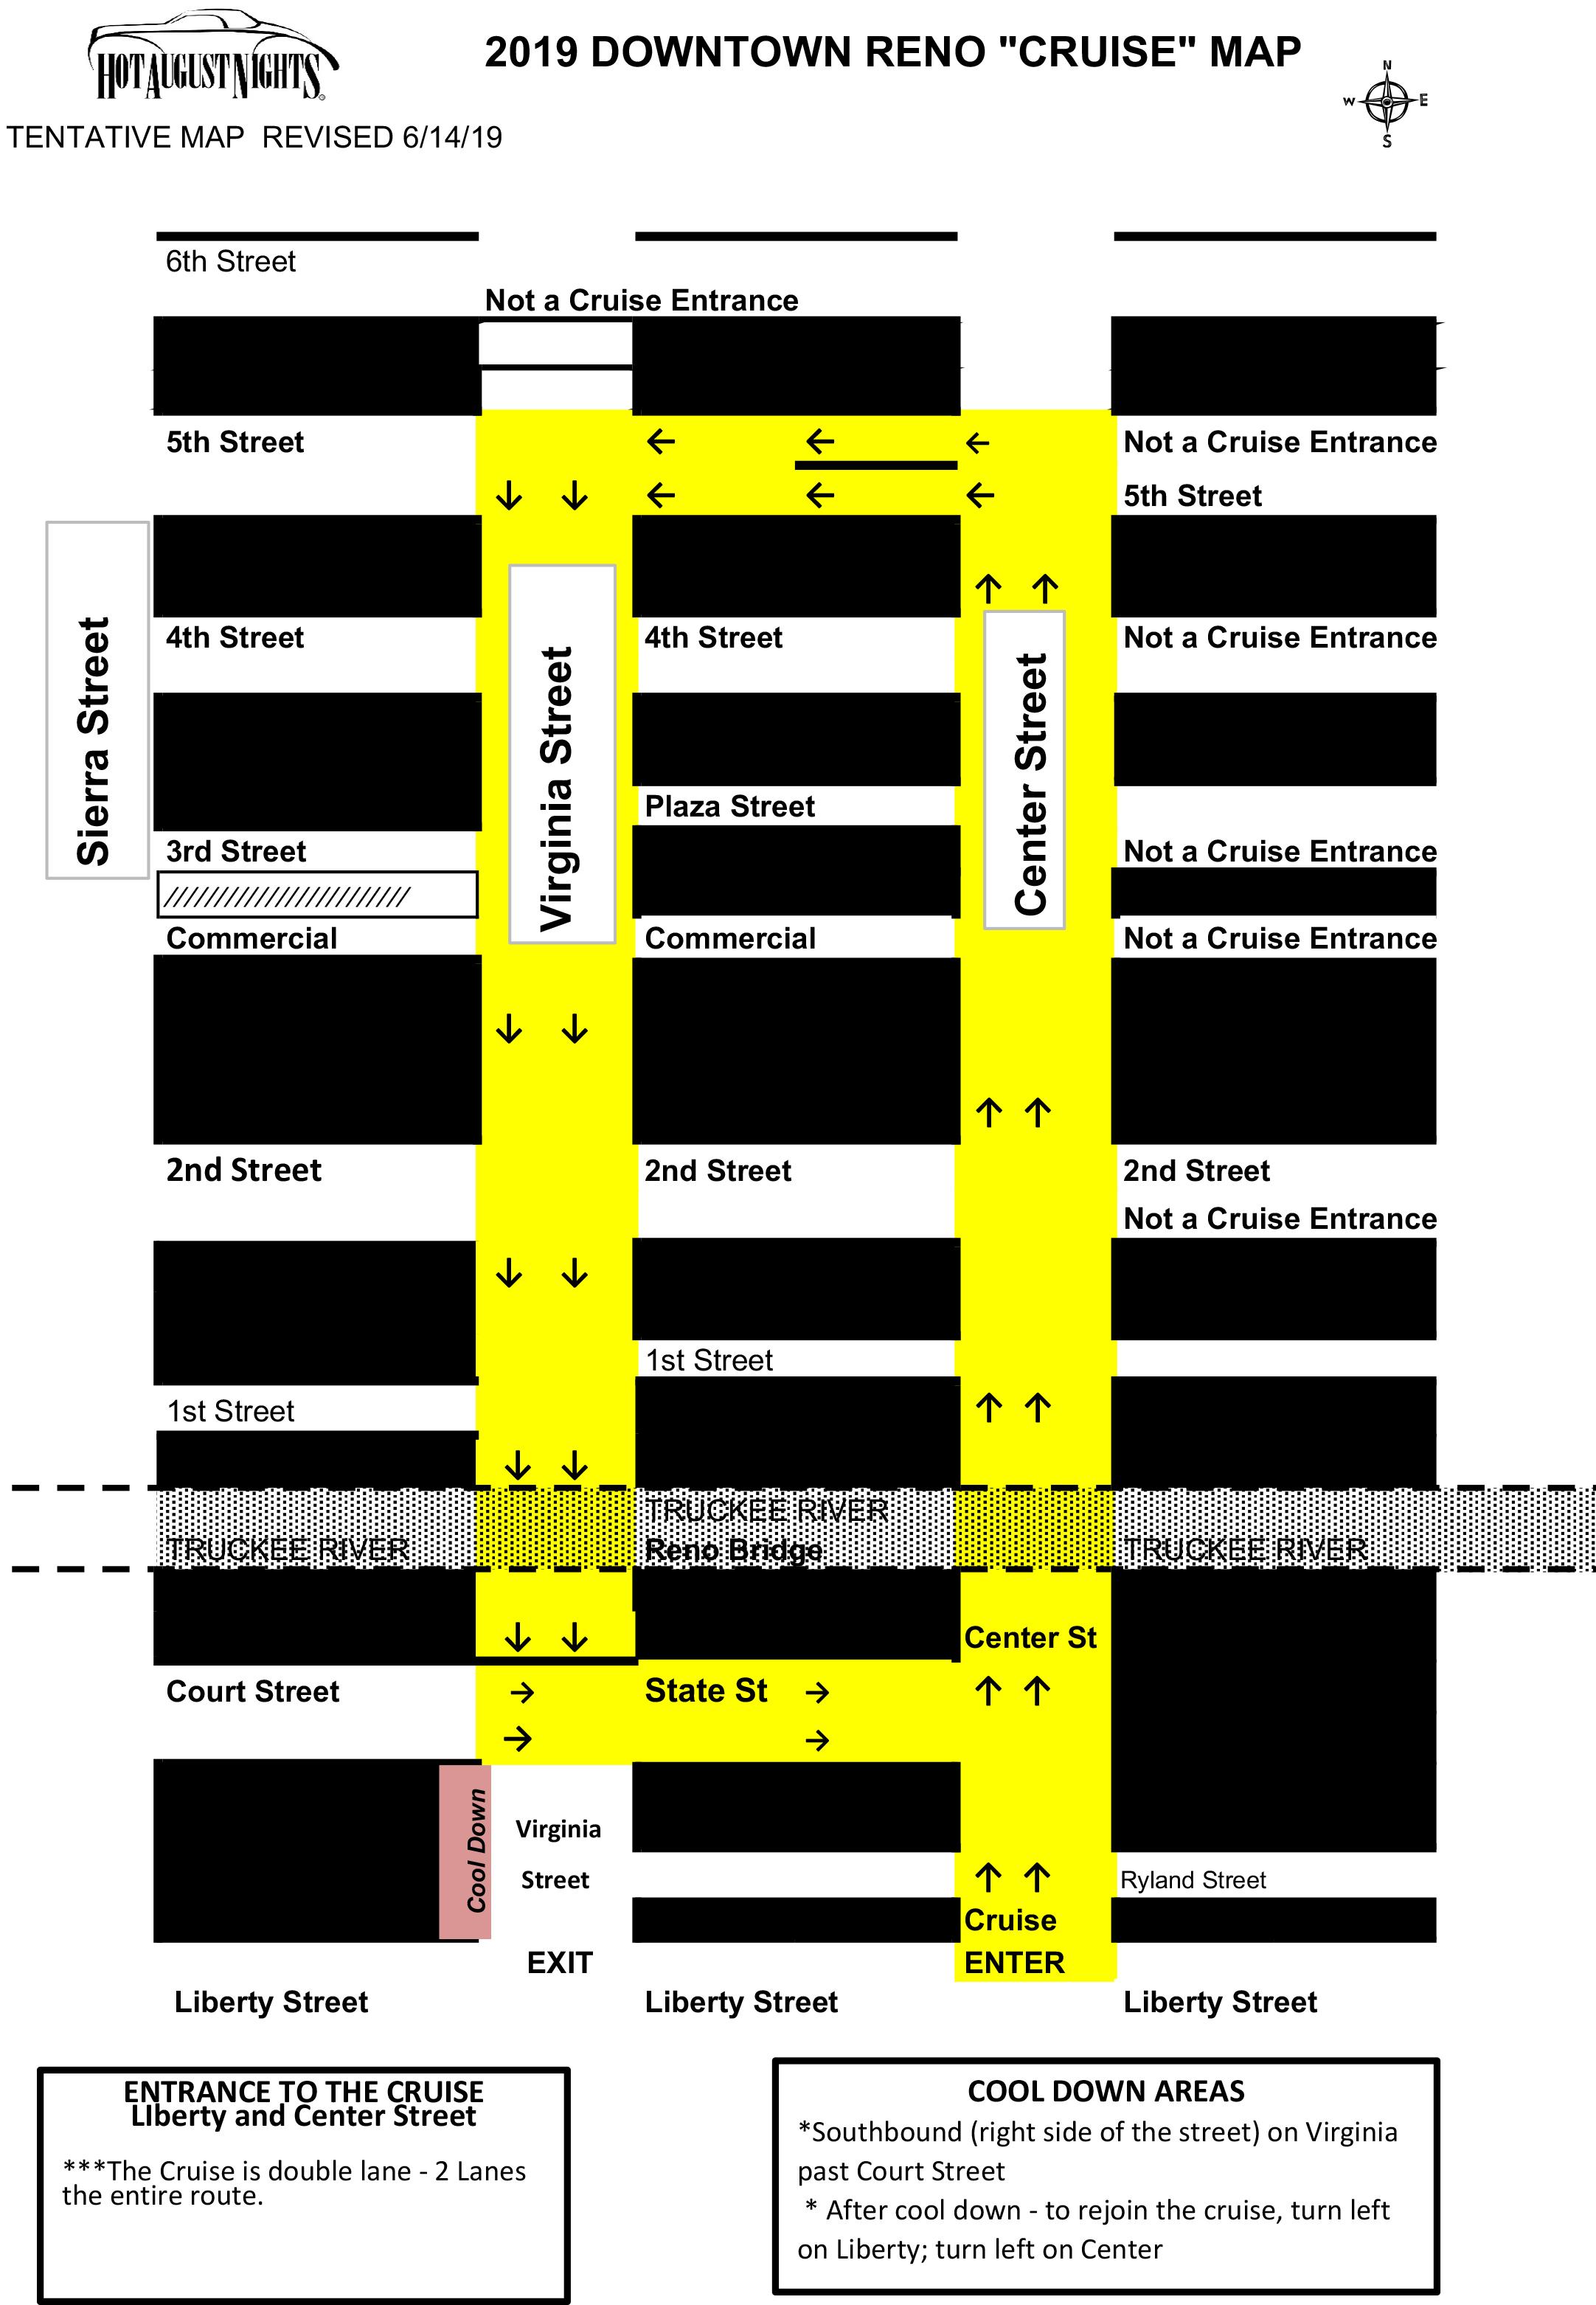 Map   Hot August Nights Map Downtown Reno on reno nevada map, reno shopping map, reno riverwalk map, reno livestock events center map, west reno map, reno rodeo map, downtown reno hotels, downtown reno at night, downtown reno library, brookside golf course map, reno casino map, midtown reno map, downtown reno nv casinos, downtown reno restaurants, downtown reno timeline, reno city map, downtown reno home, las vegas hotel map, dowtown reno strip map, lake tahoe map,